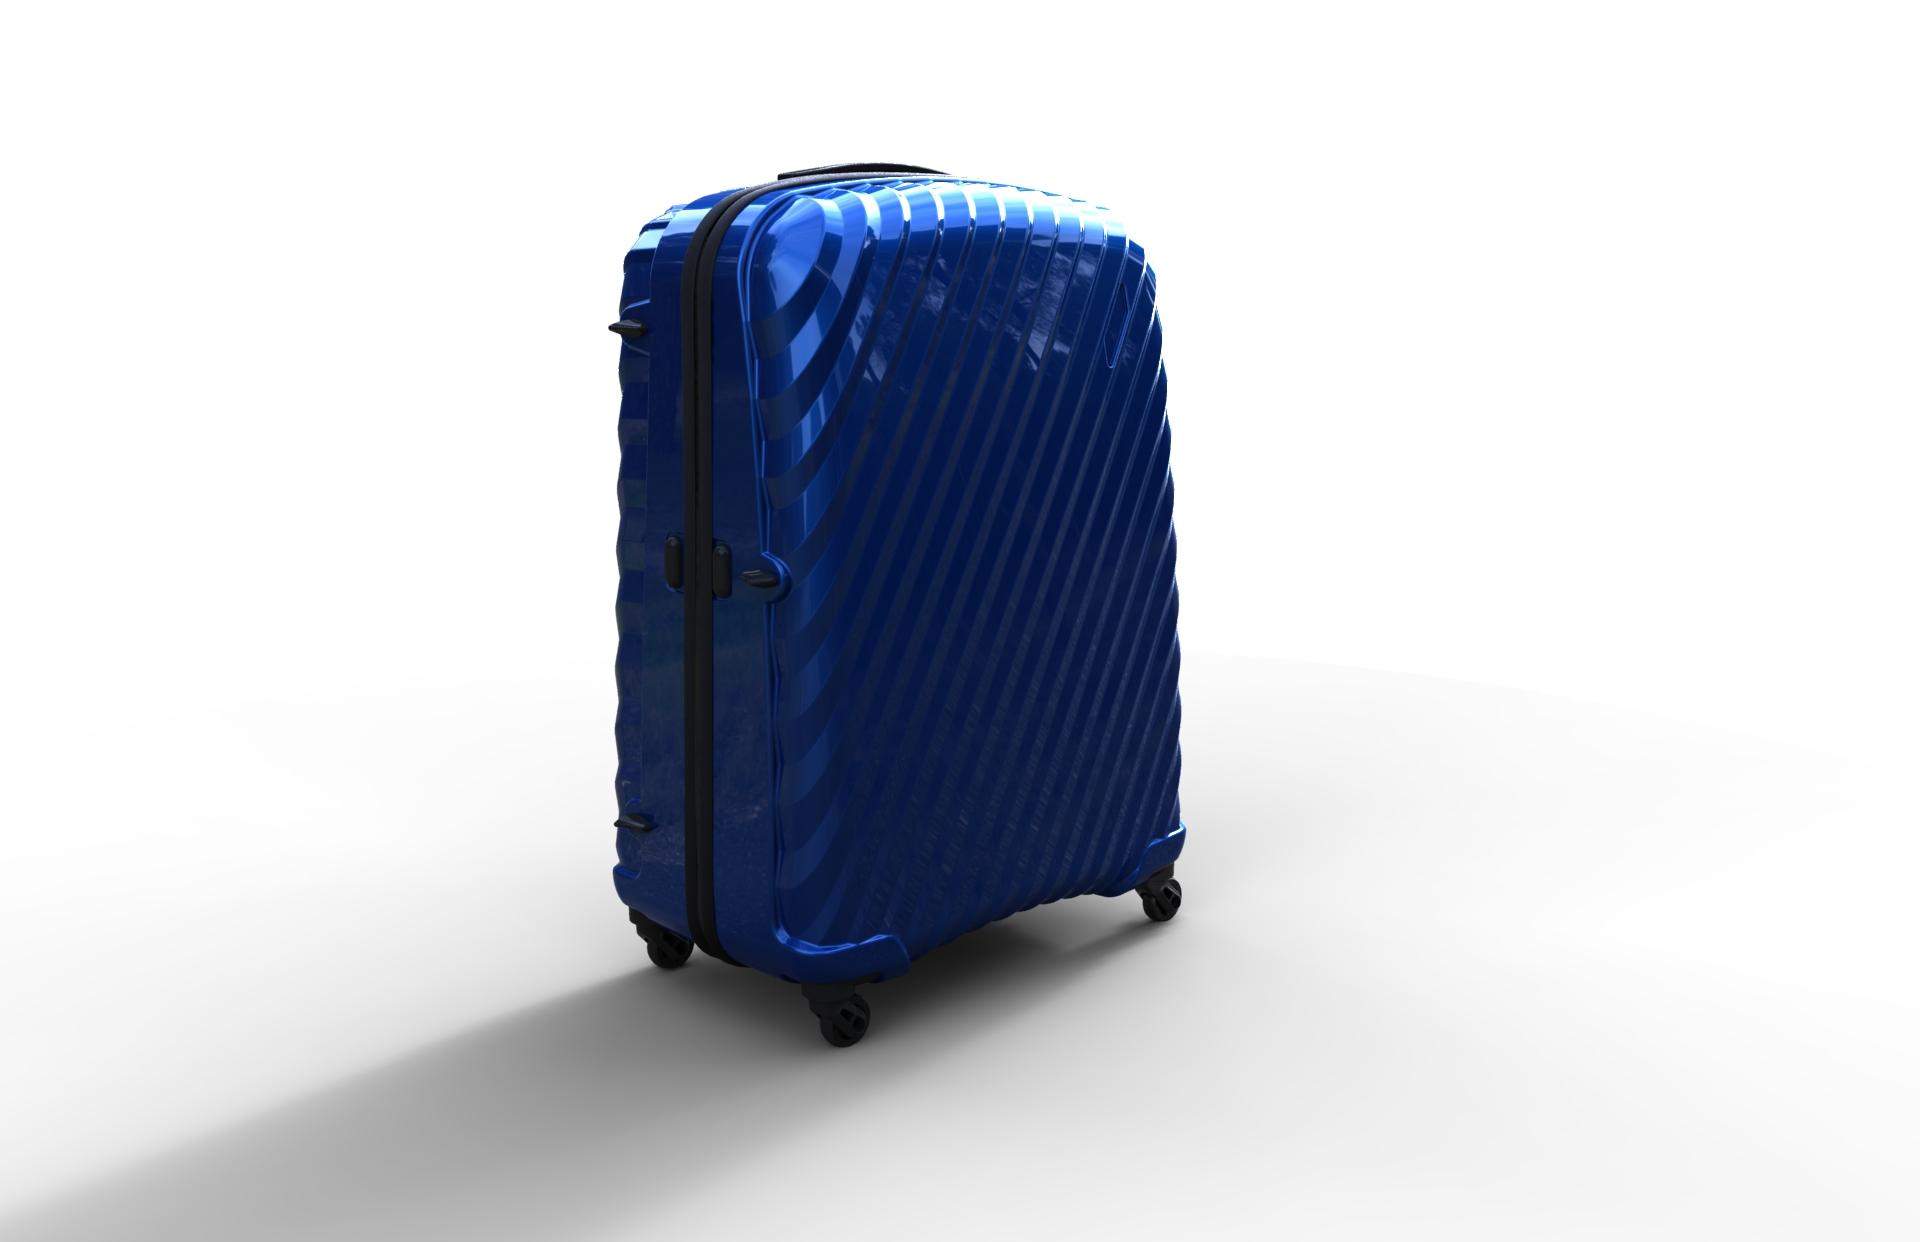 trolley suitcase bag 03 3d model max fbx ma mb obj 286005